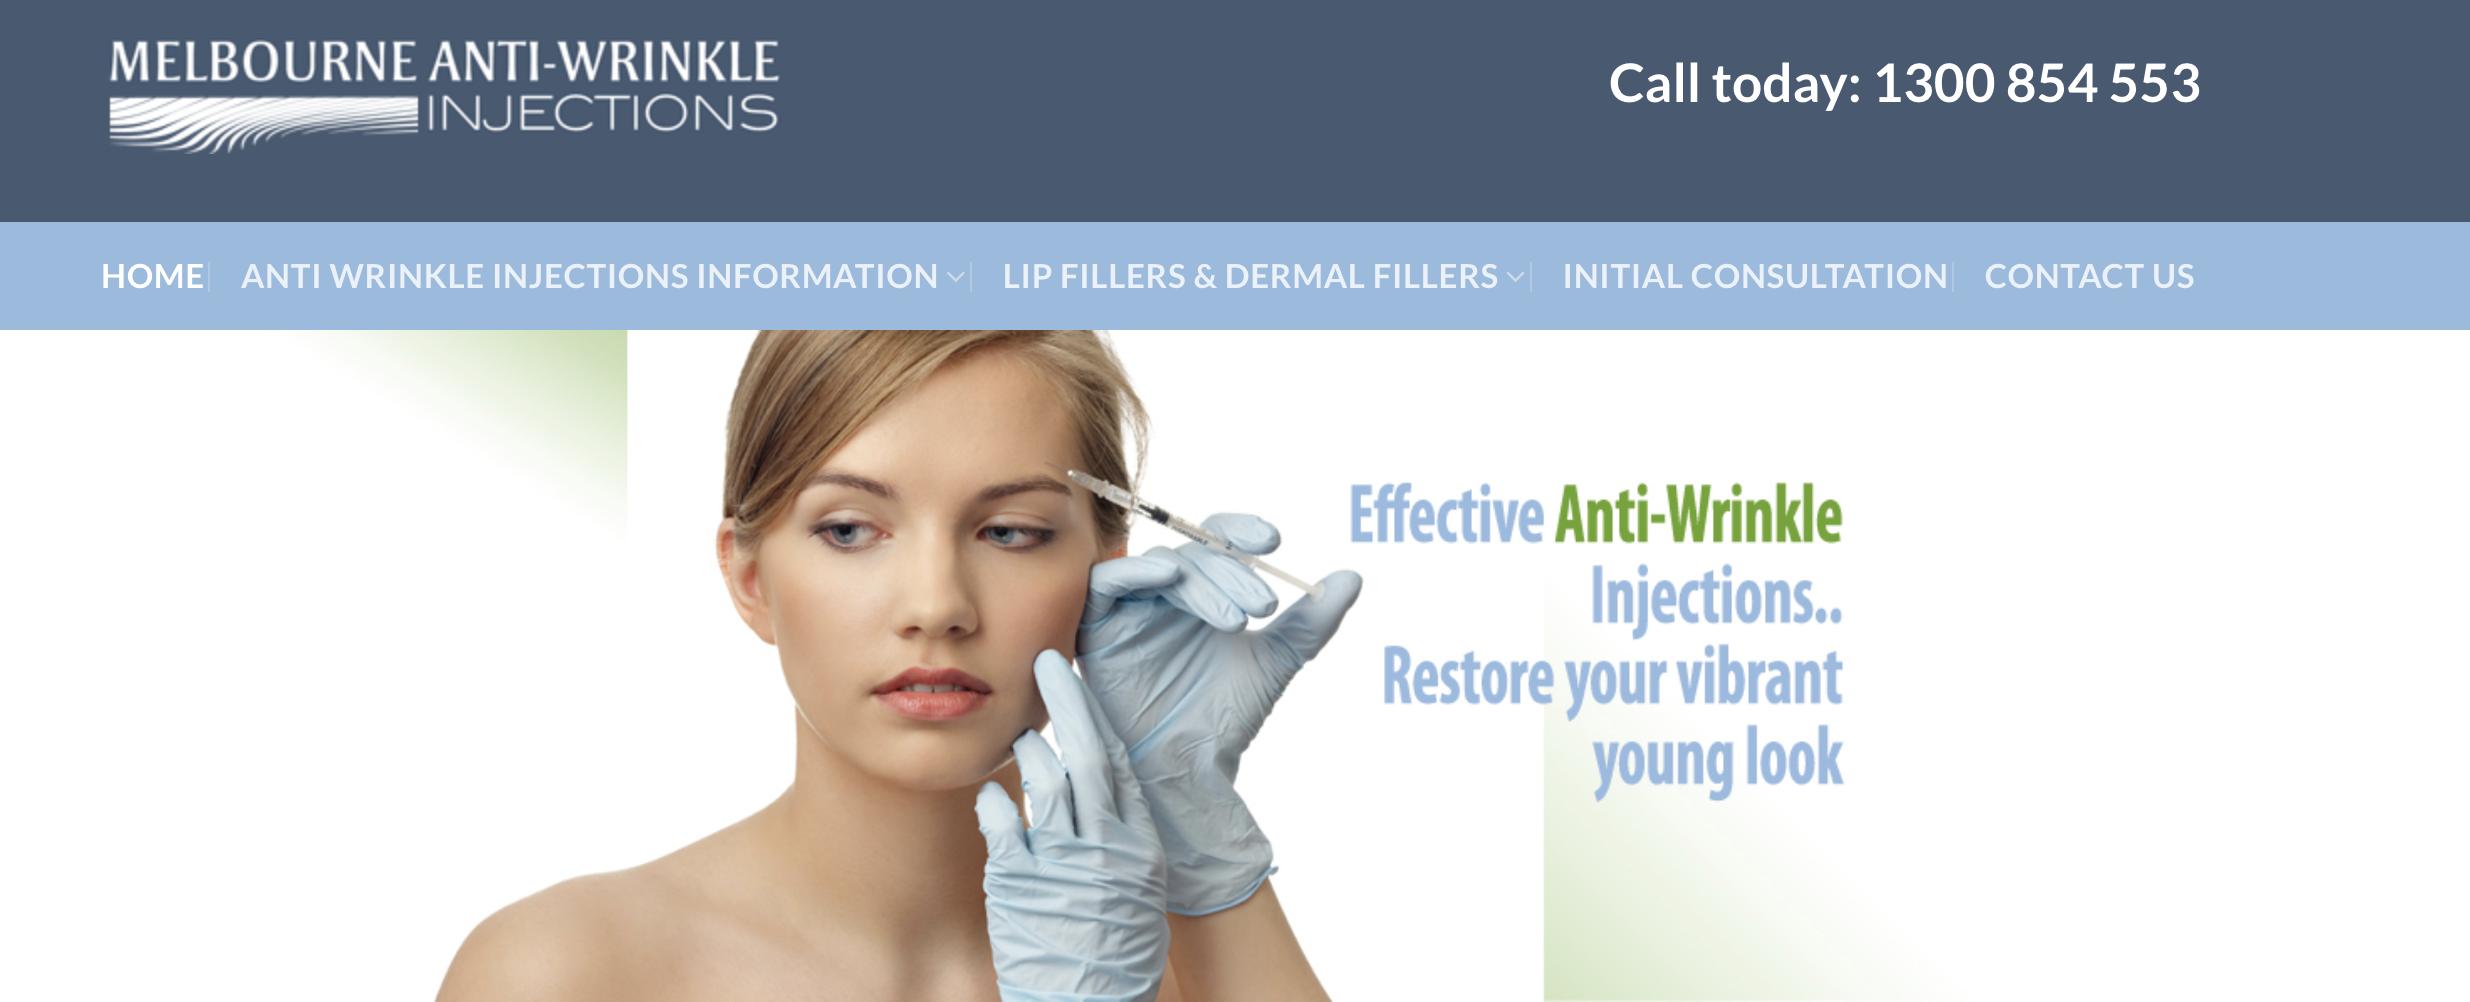 Top 10 Botox Injections Doctors in Melbourne - Botox ...